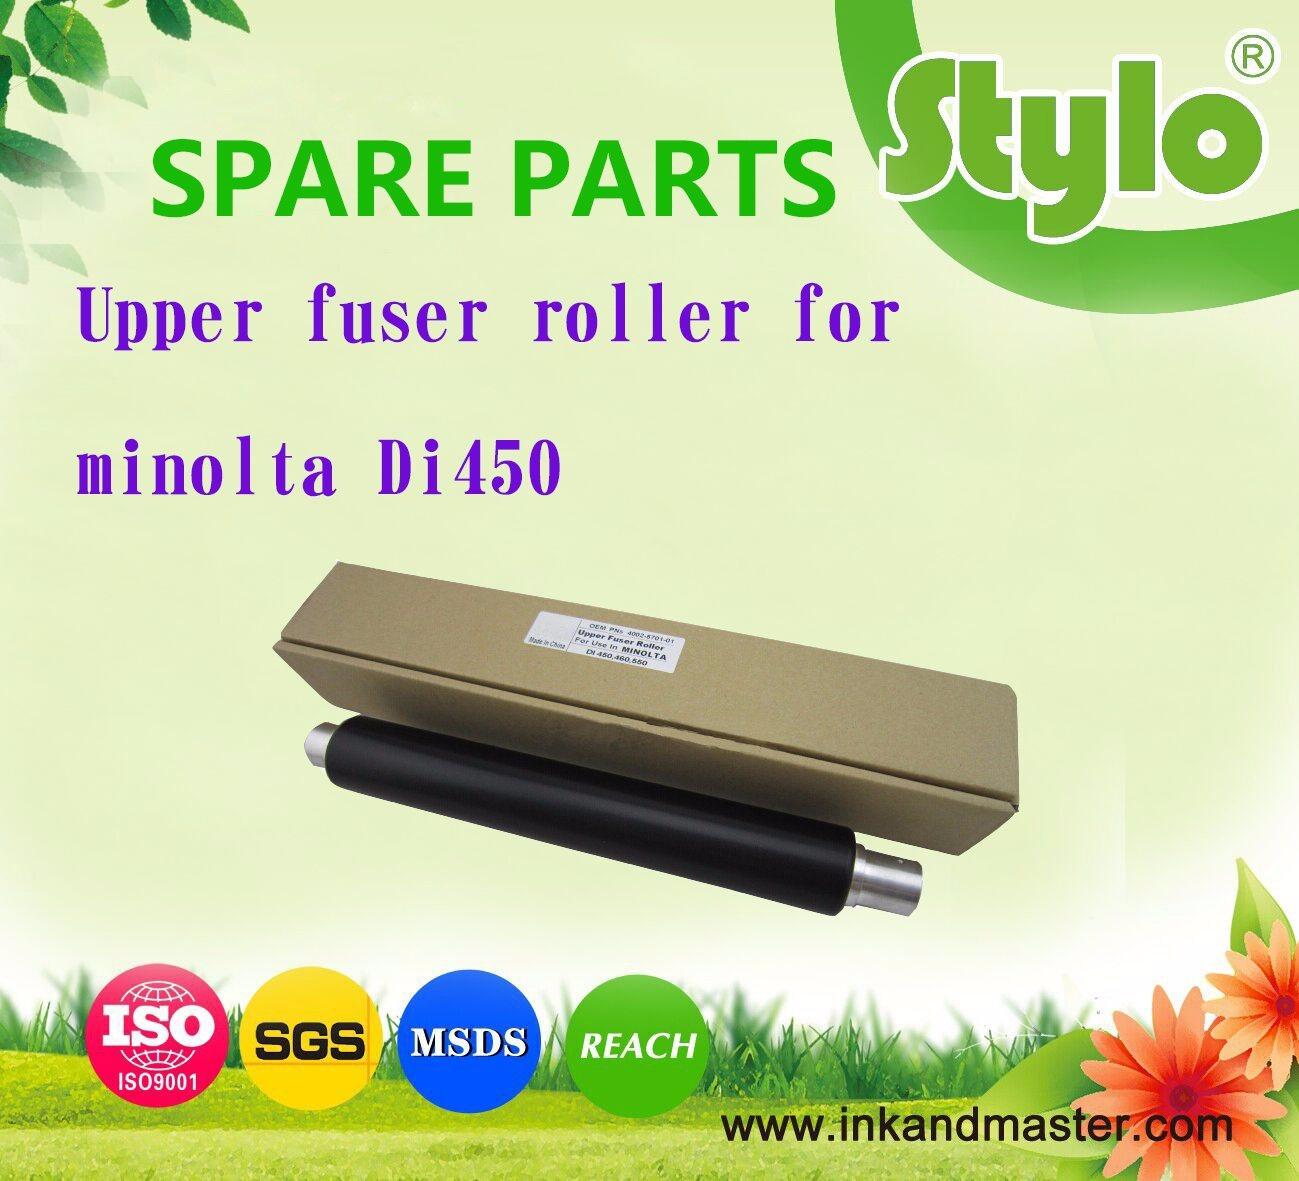 Printer Spare Parts for Konica Minolta Di450 Di550 Upper Fuser Roller 4002-5701-01 Upper Roller